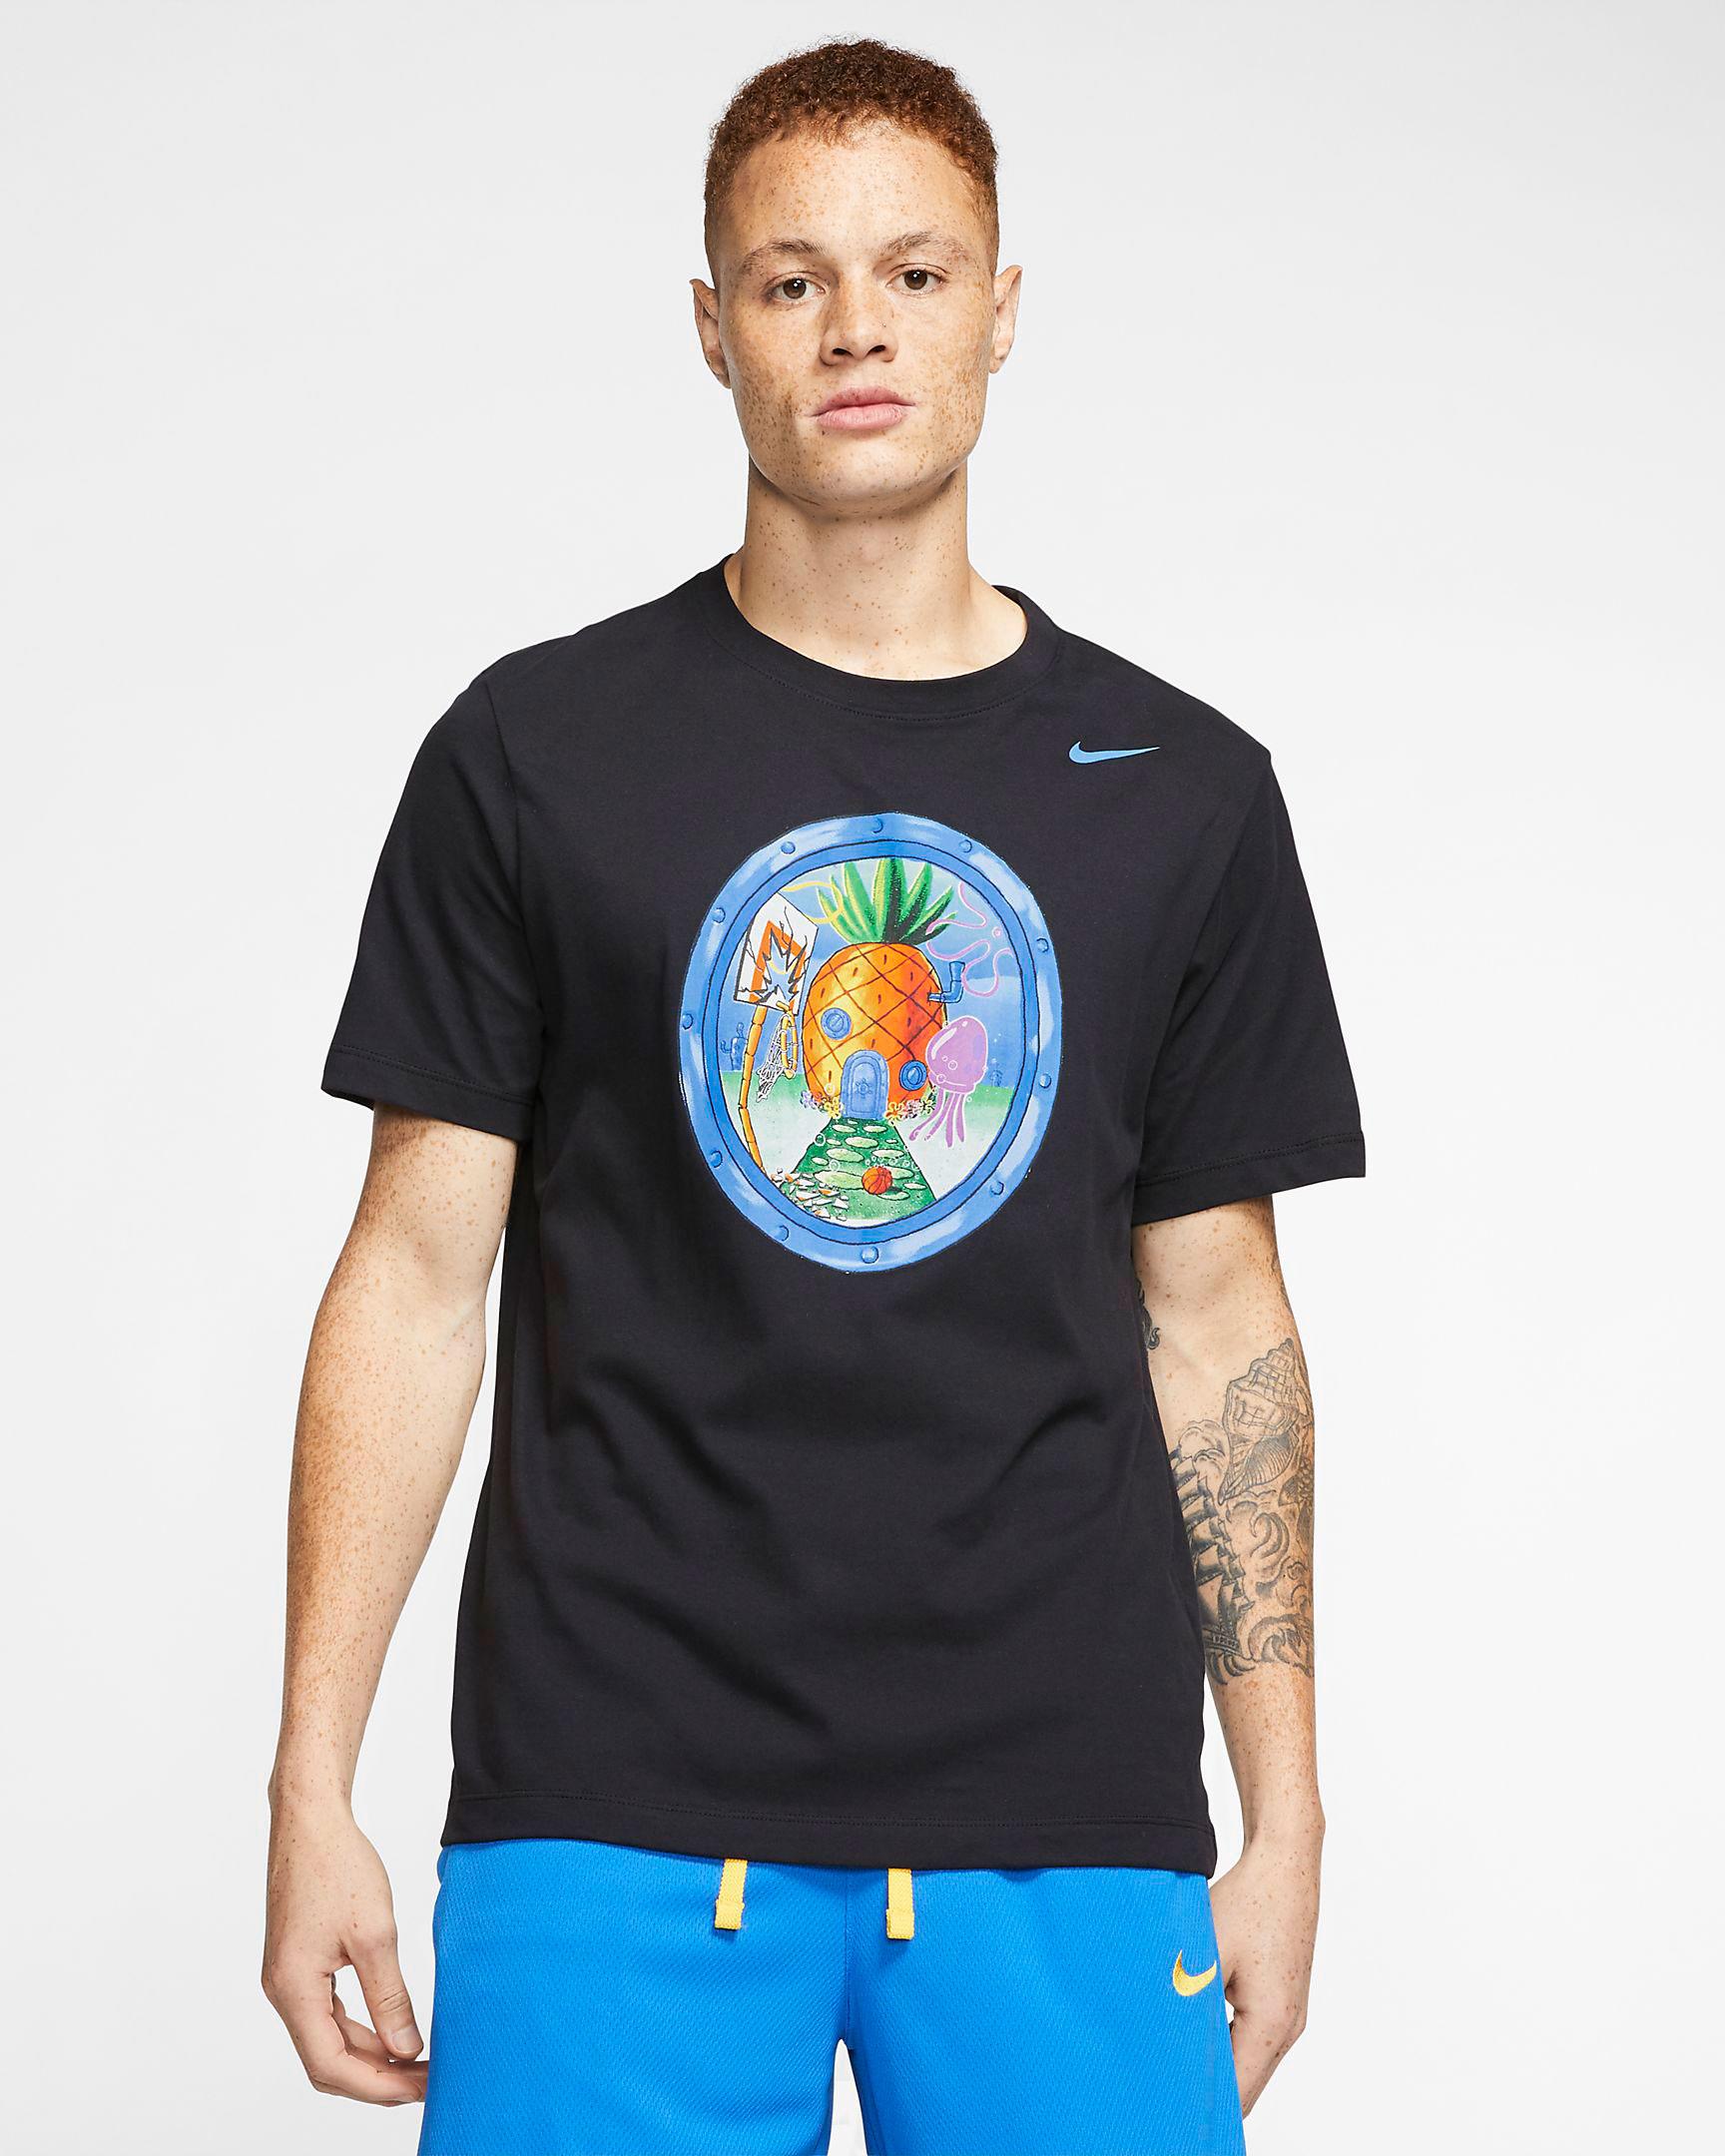 spongebob-nike-kyrie-pineapple-house-shirt-1